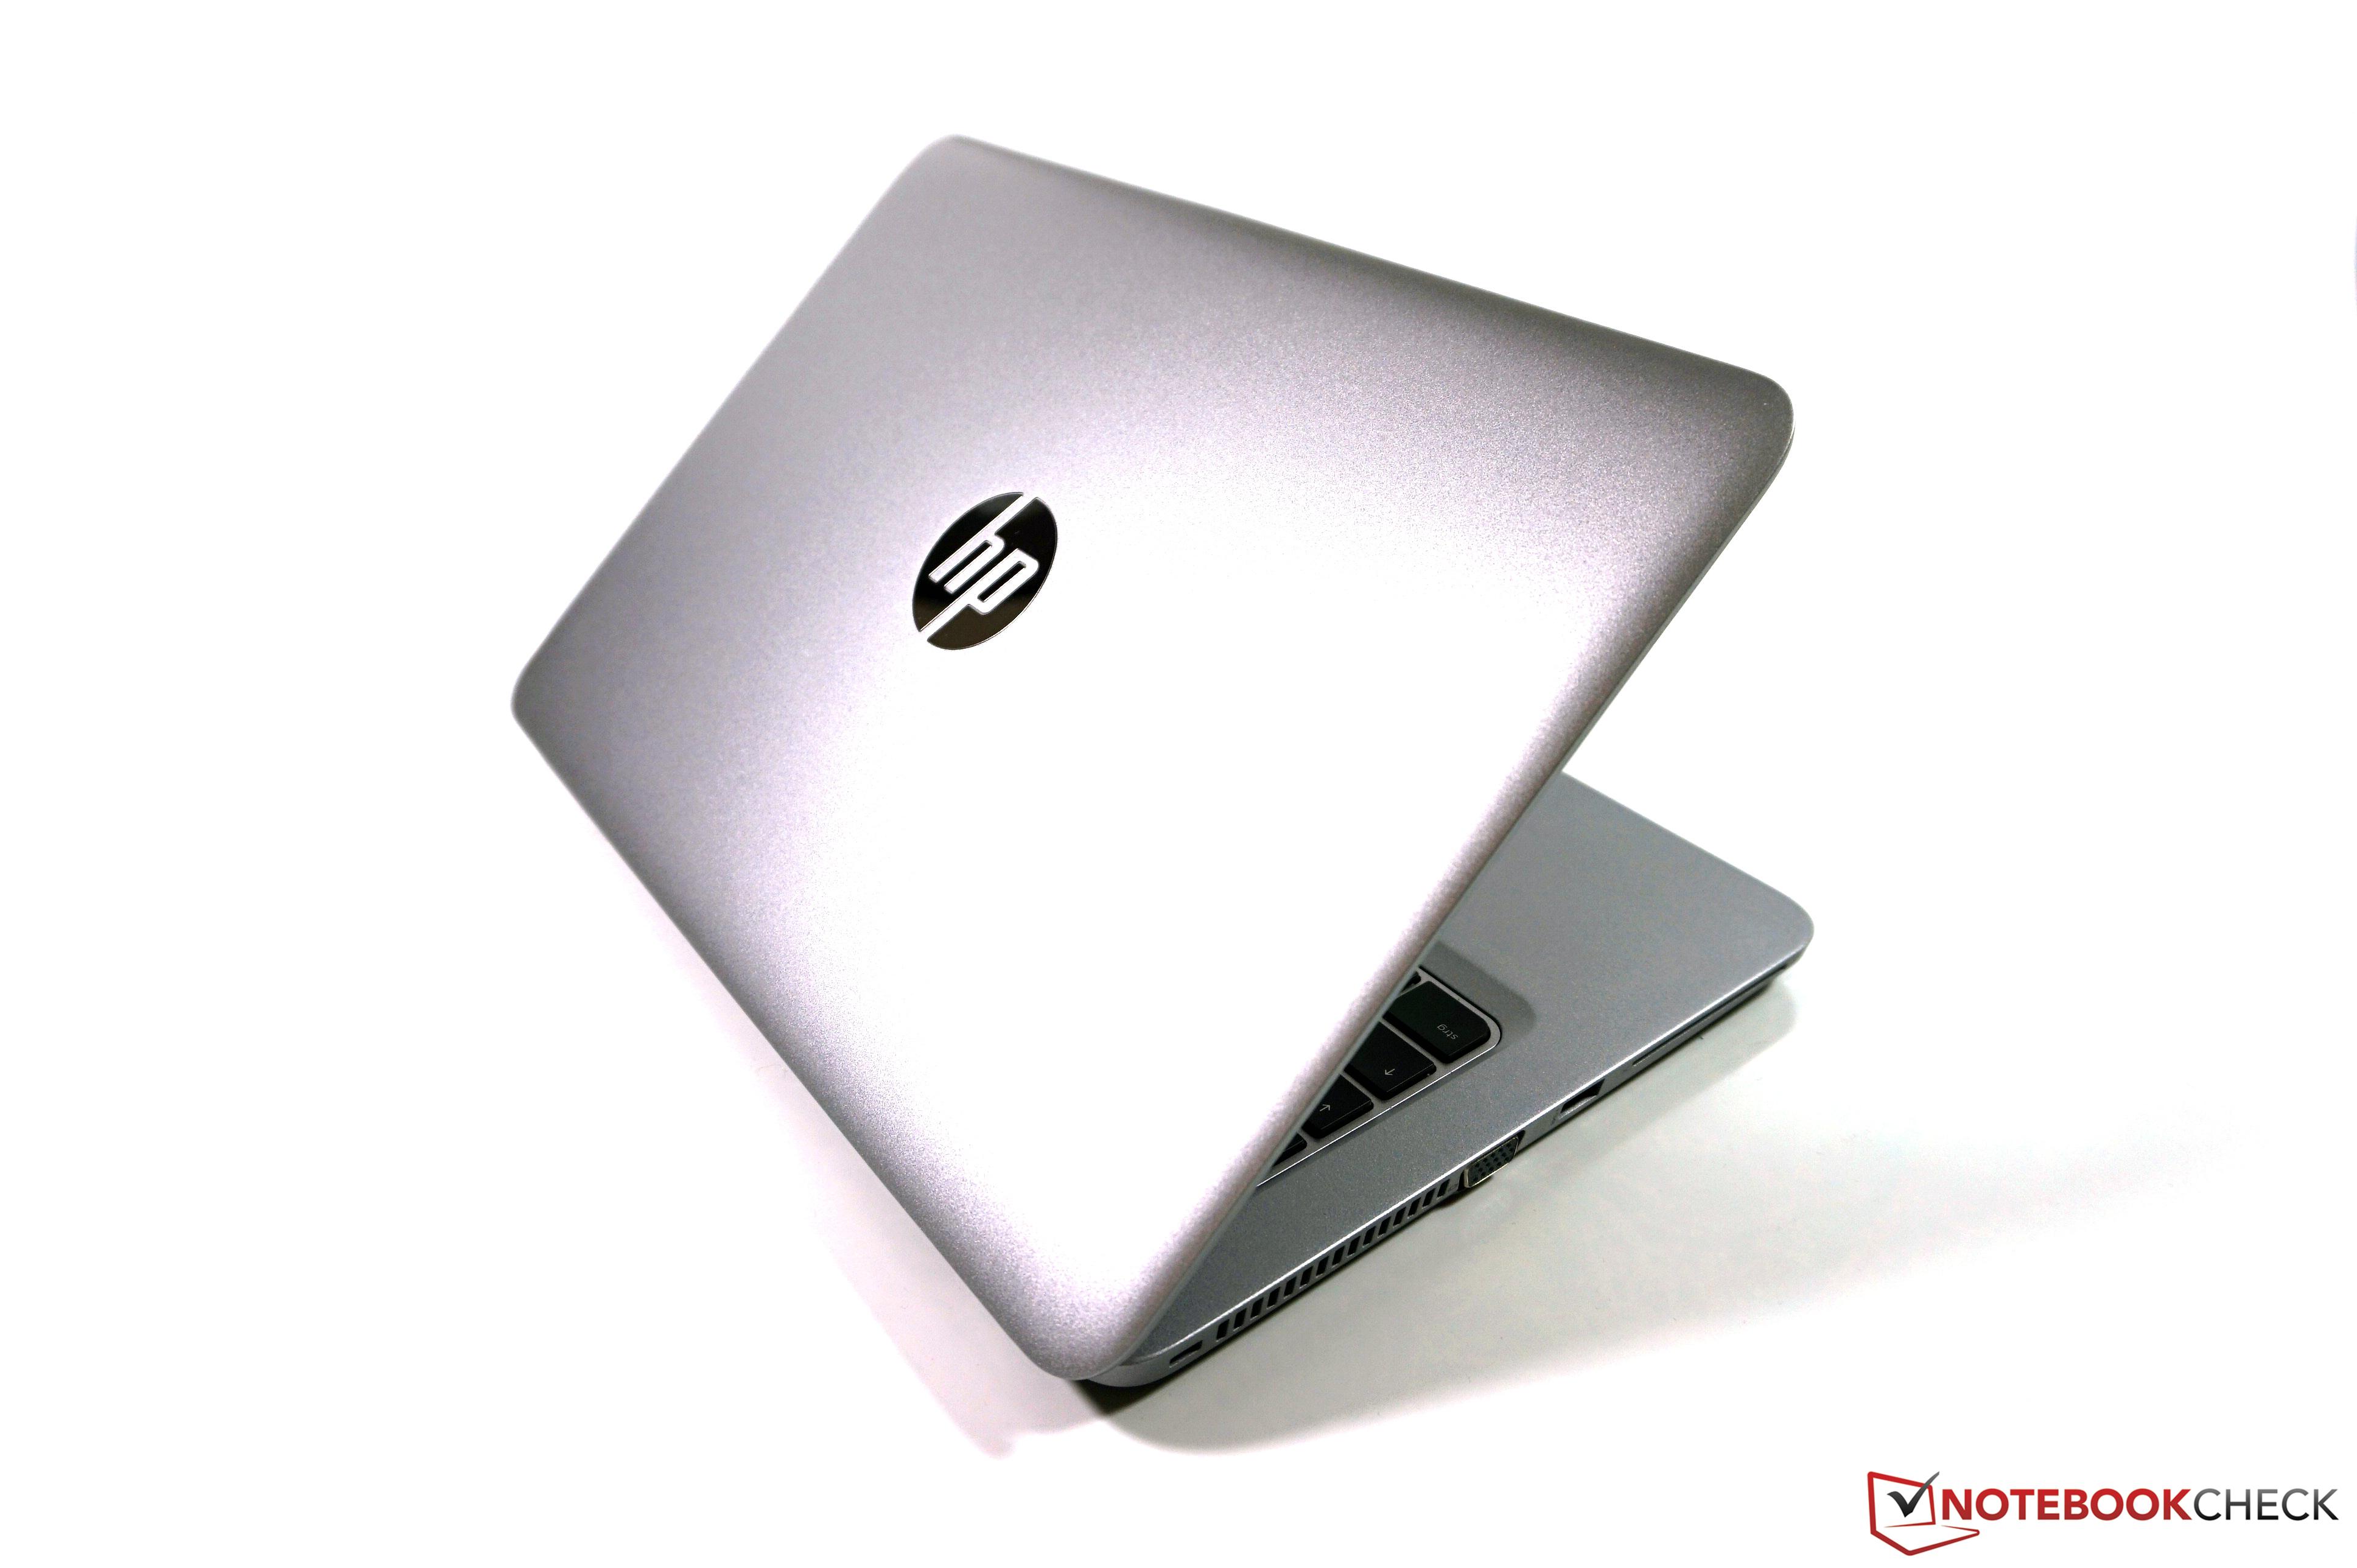 HP EliteBook 820 G3 Conexant HD Audio Driver for Mac Download